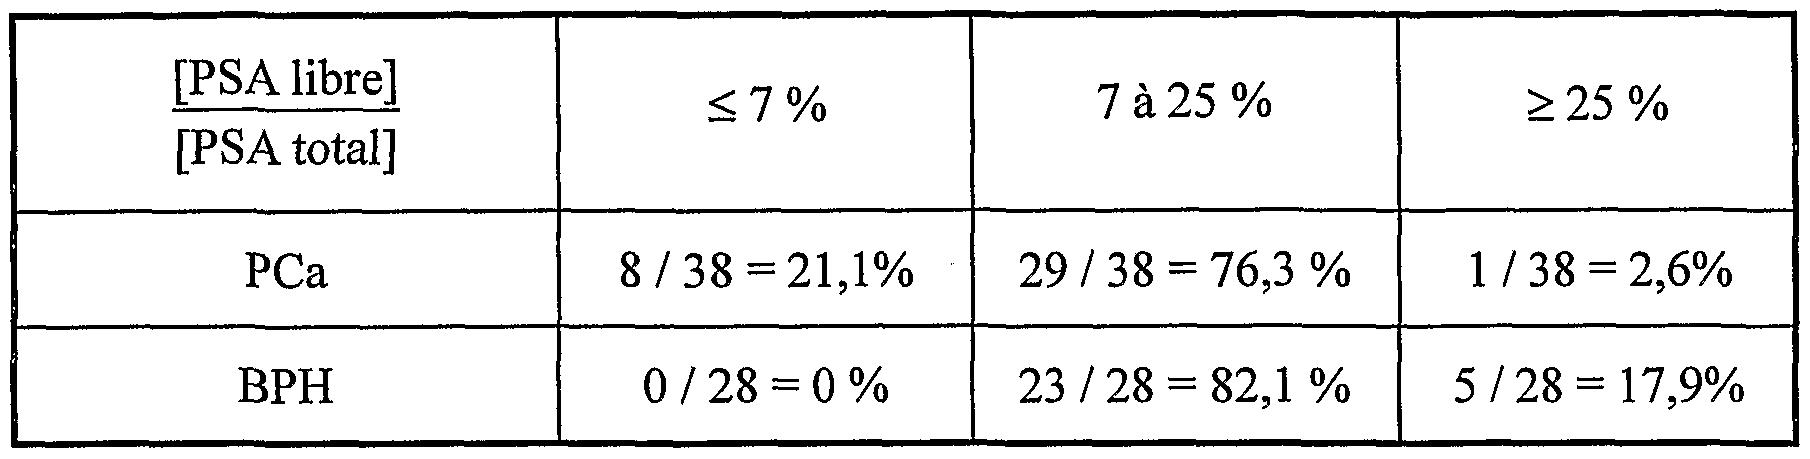 comment calculer ratio psa libre psa total